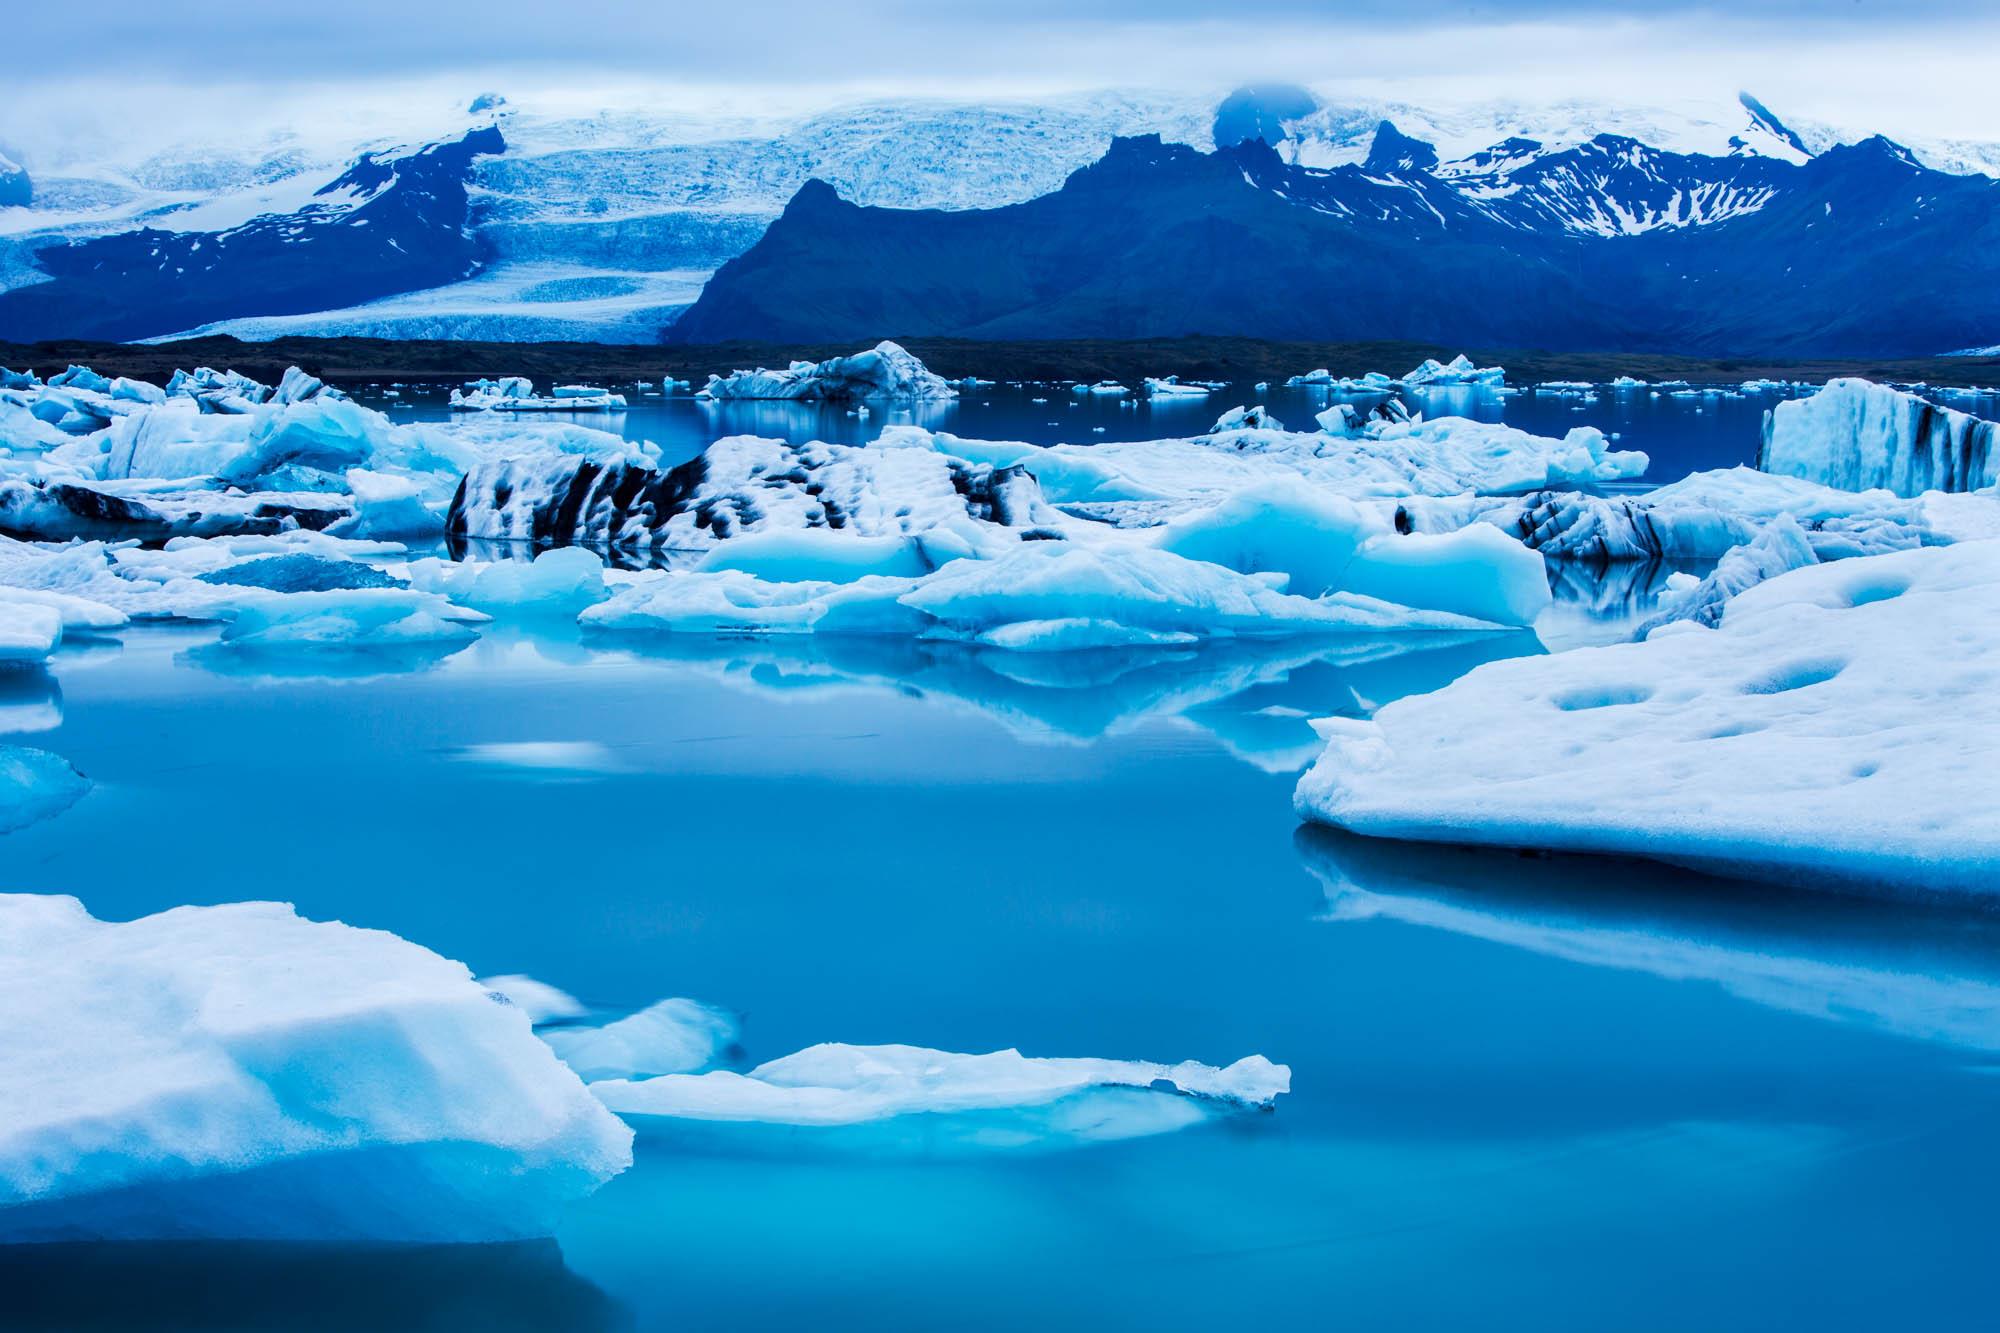 Iceland Glacier Lagoon Reflections